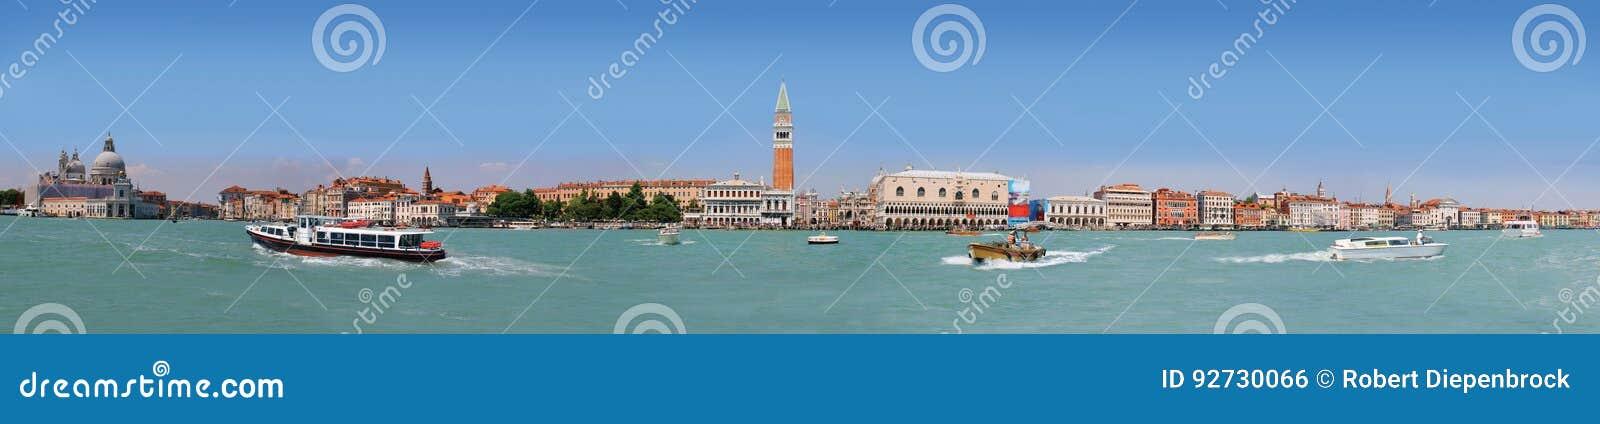 Panorama of Venice Lagoon